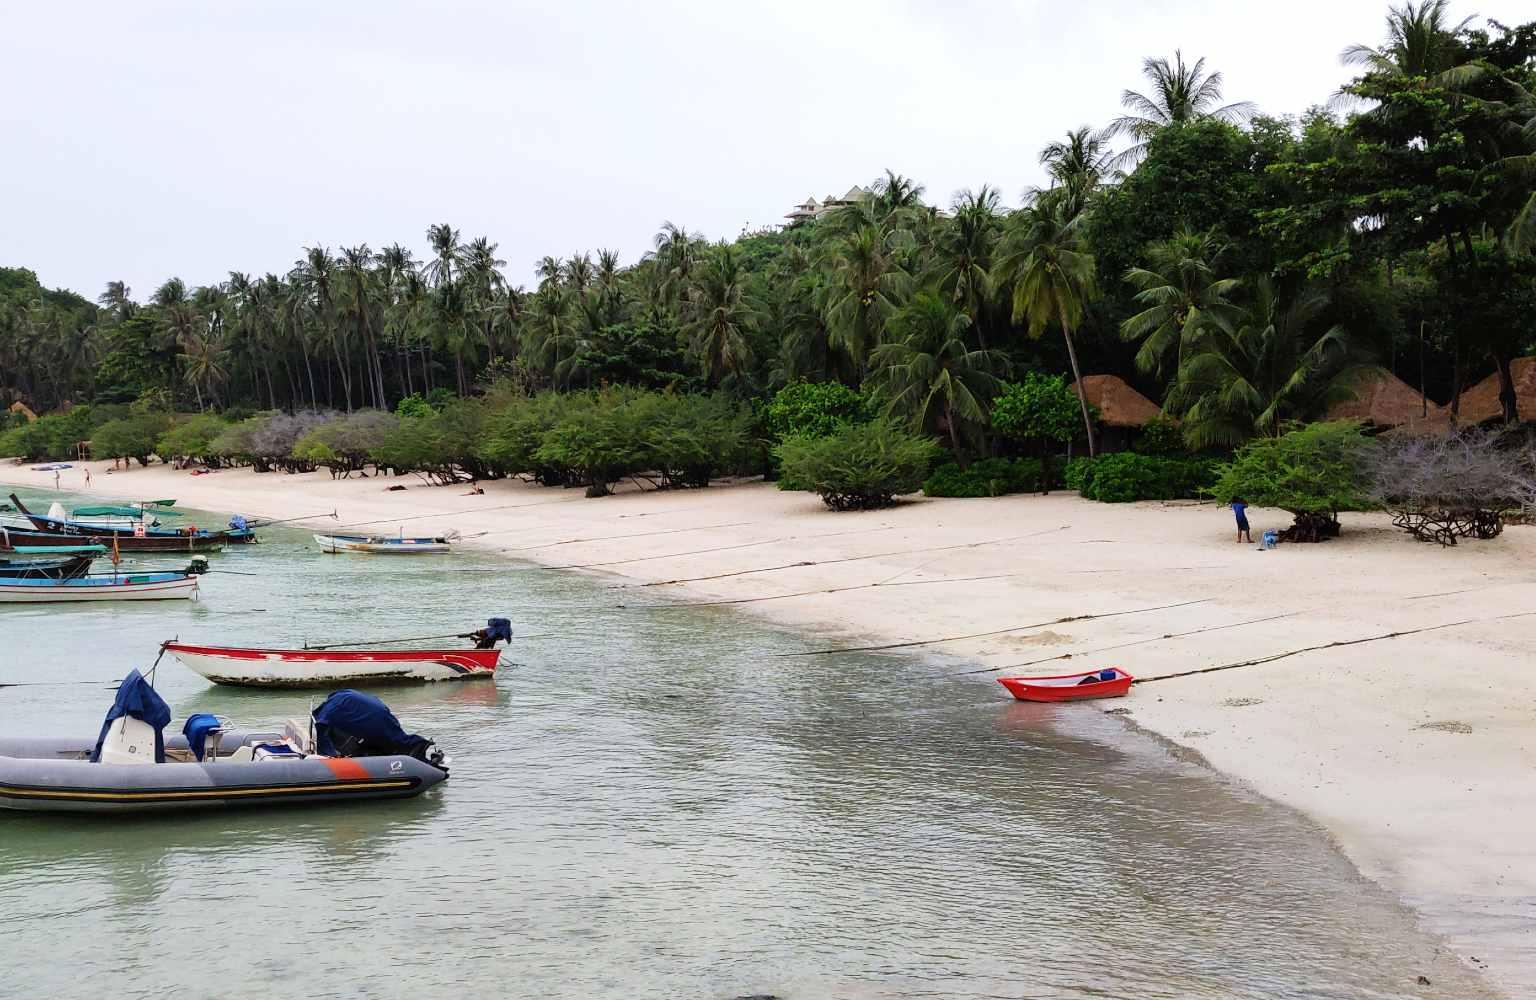 Shark Bay (Thian Og Bay) on Koh Tao, Thailand